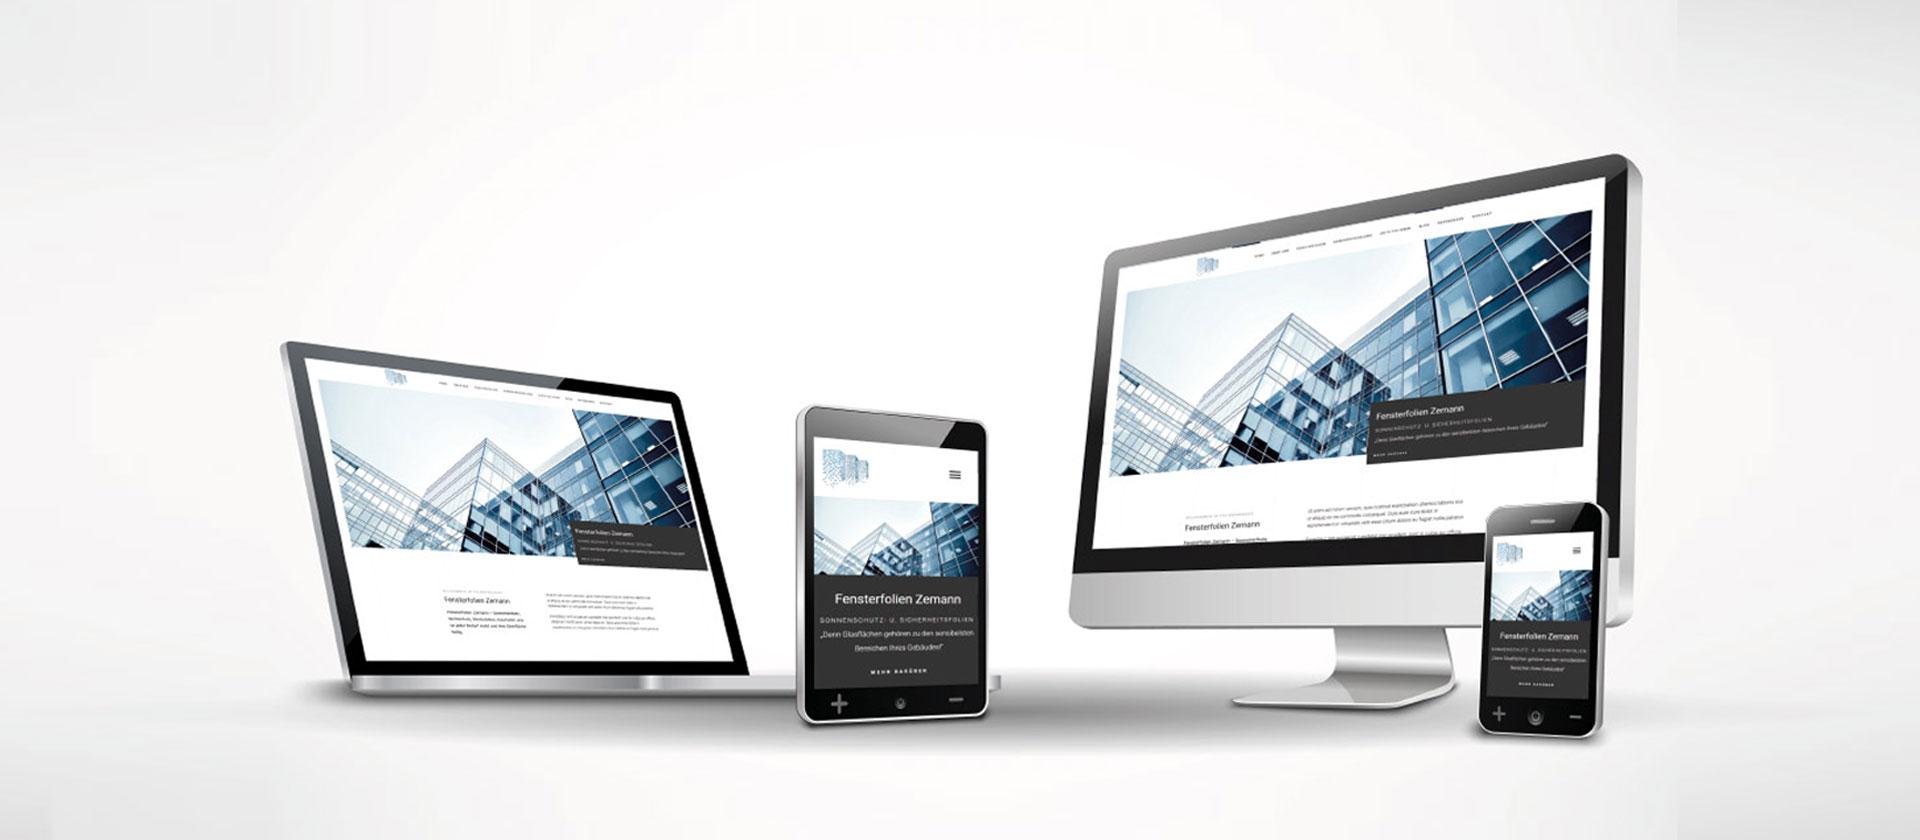 Redesign Fensterfolien Zemann | webundwerbung.at